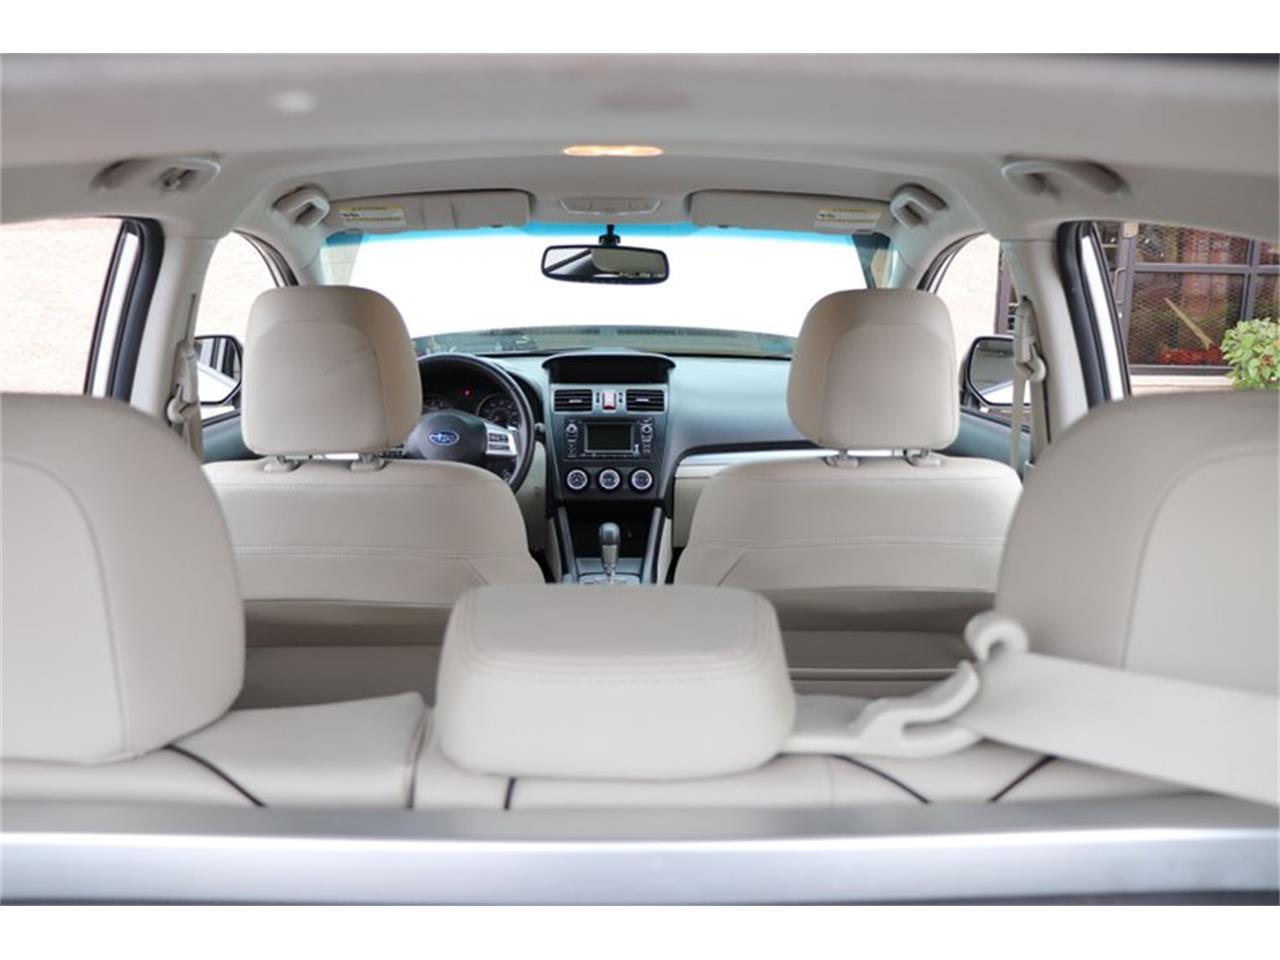 2014 Subaru XV Crosstrek (CC-1415745) for sale in Alsip, Illinois